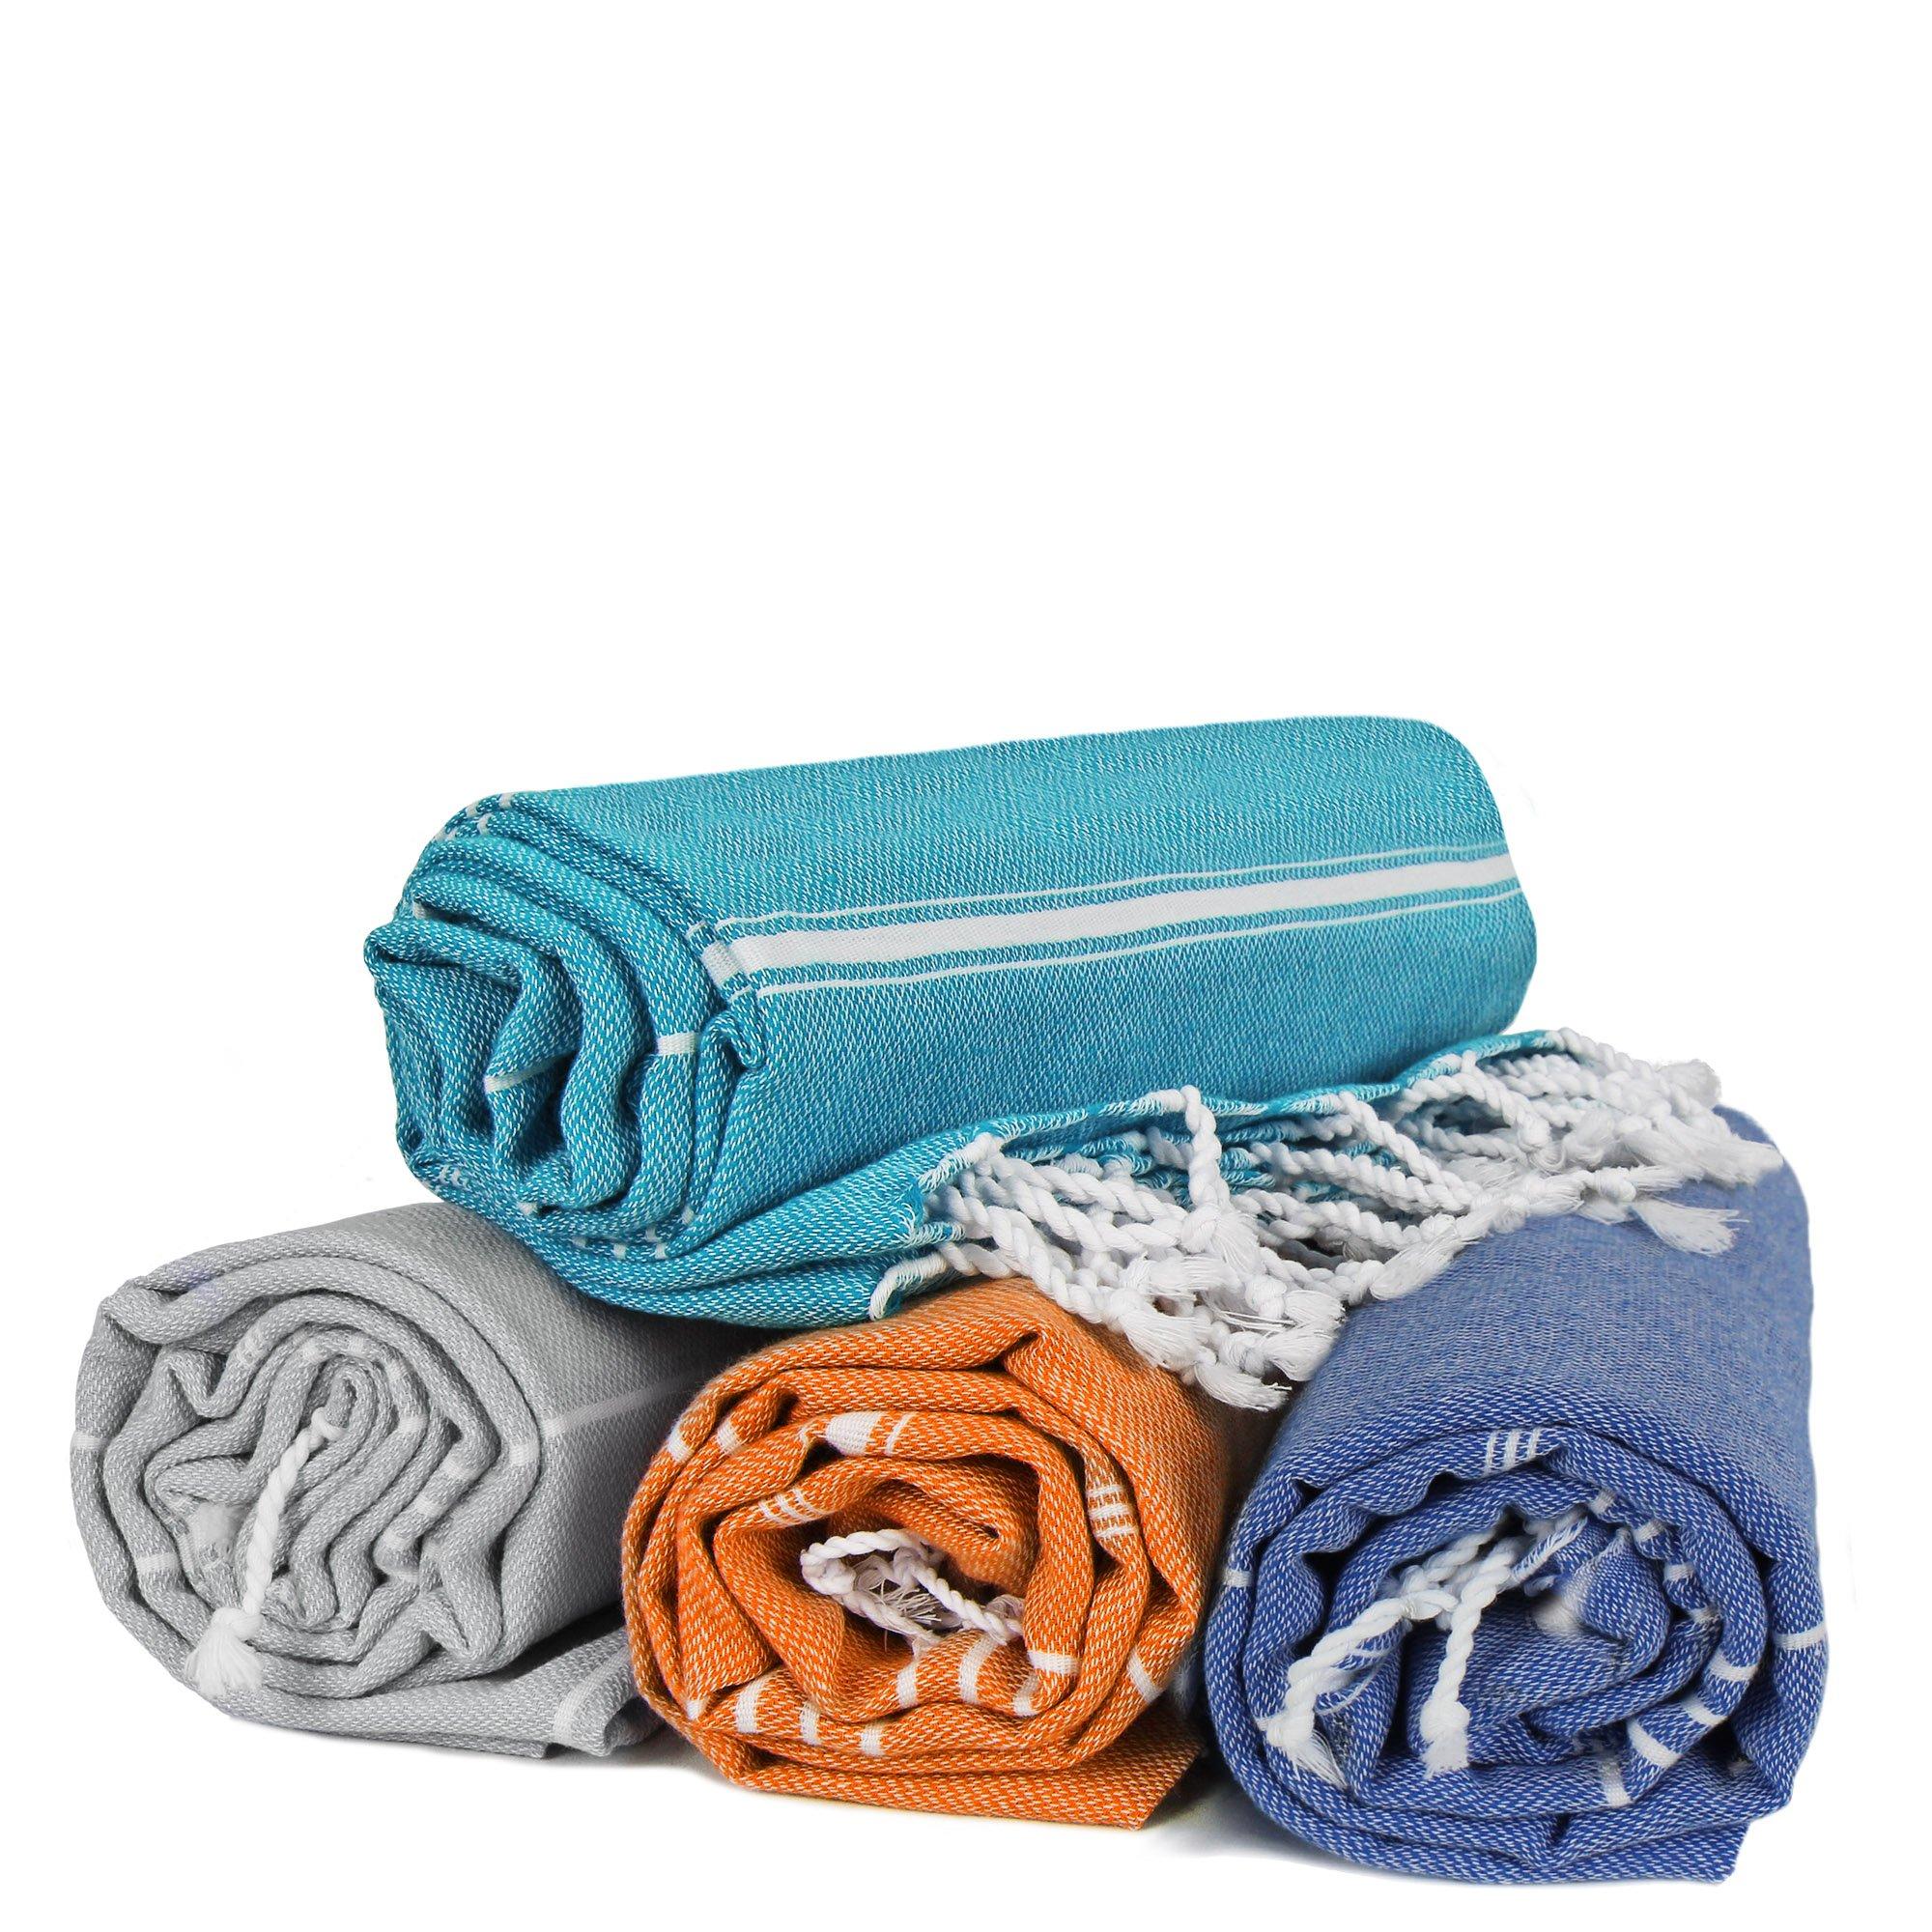 Turkuoise Peshtemal - Set of 4 - Genuine Flat Woven Turkish Towel - Pareo - Sarong - Picnic Blanket - Yoga Mat - Fouta (Coral, Turquoise, Grey, Royal Blue)